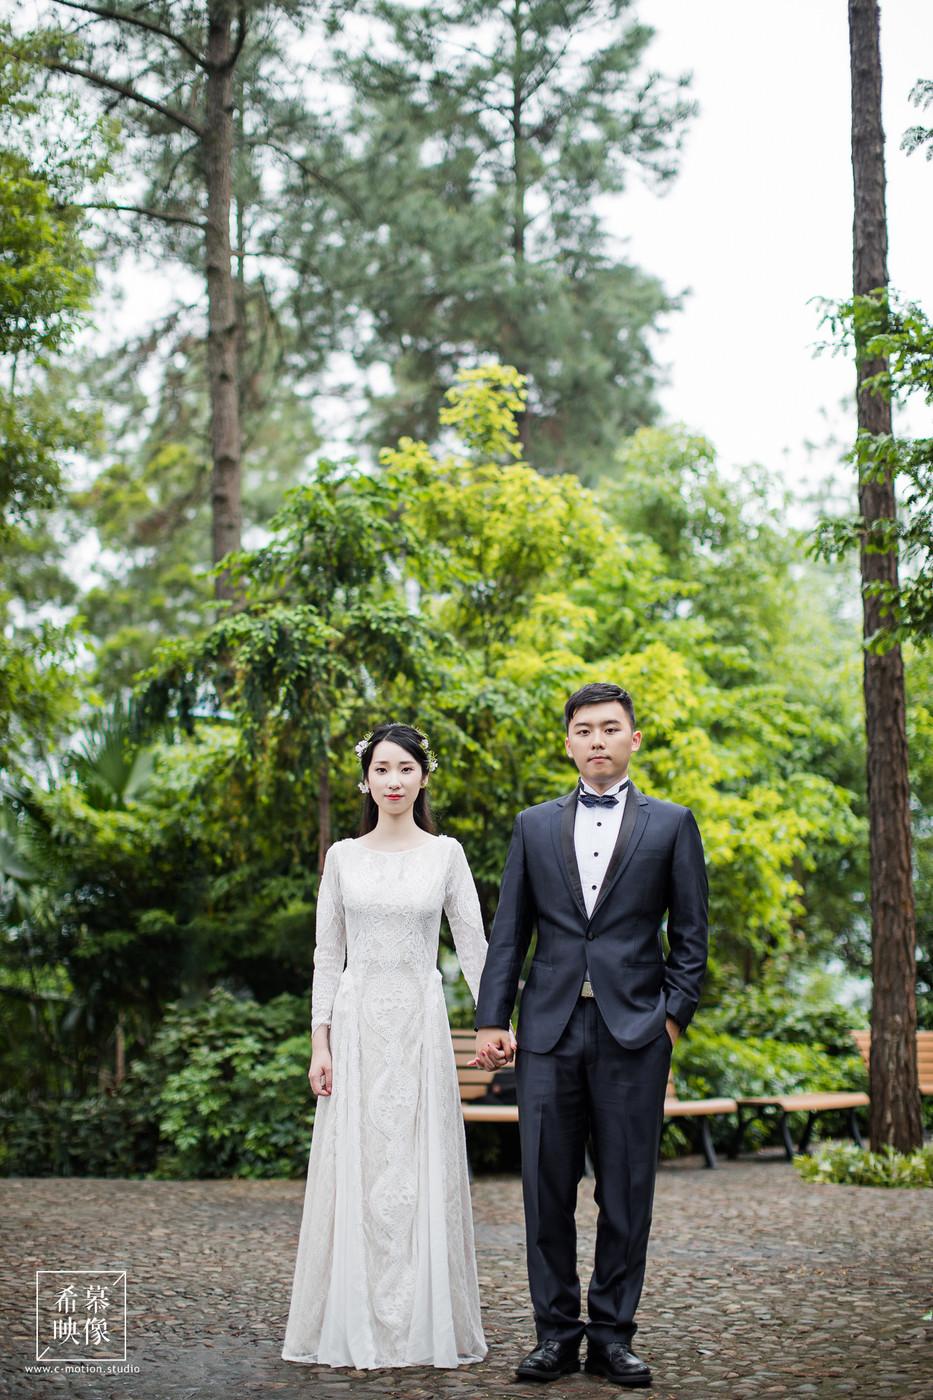 Cong&LiLi's Wedding58